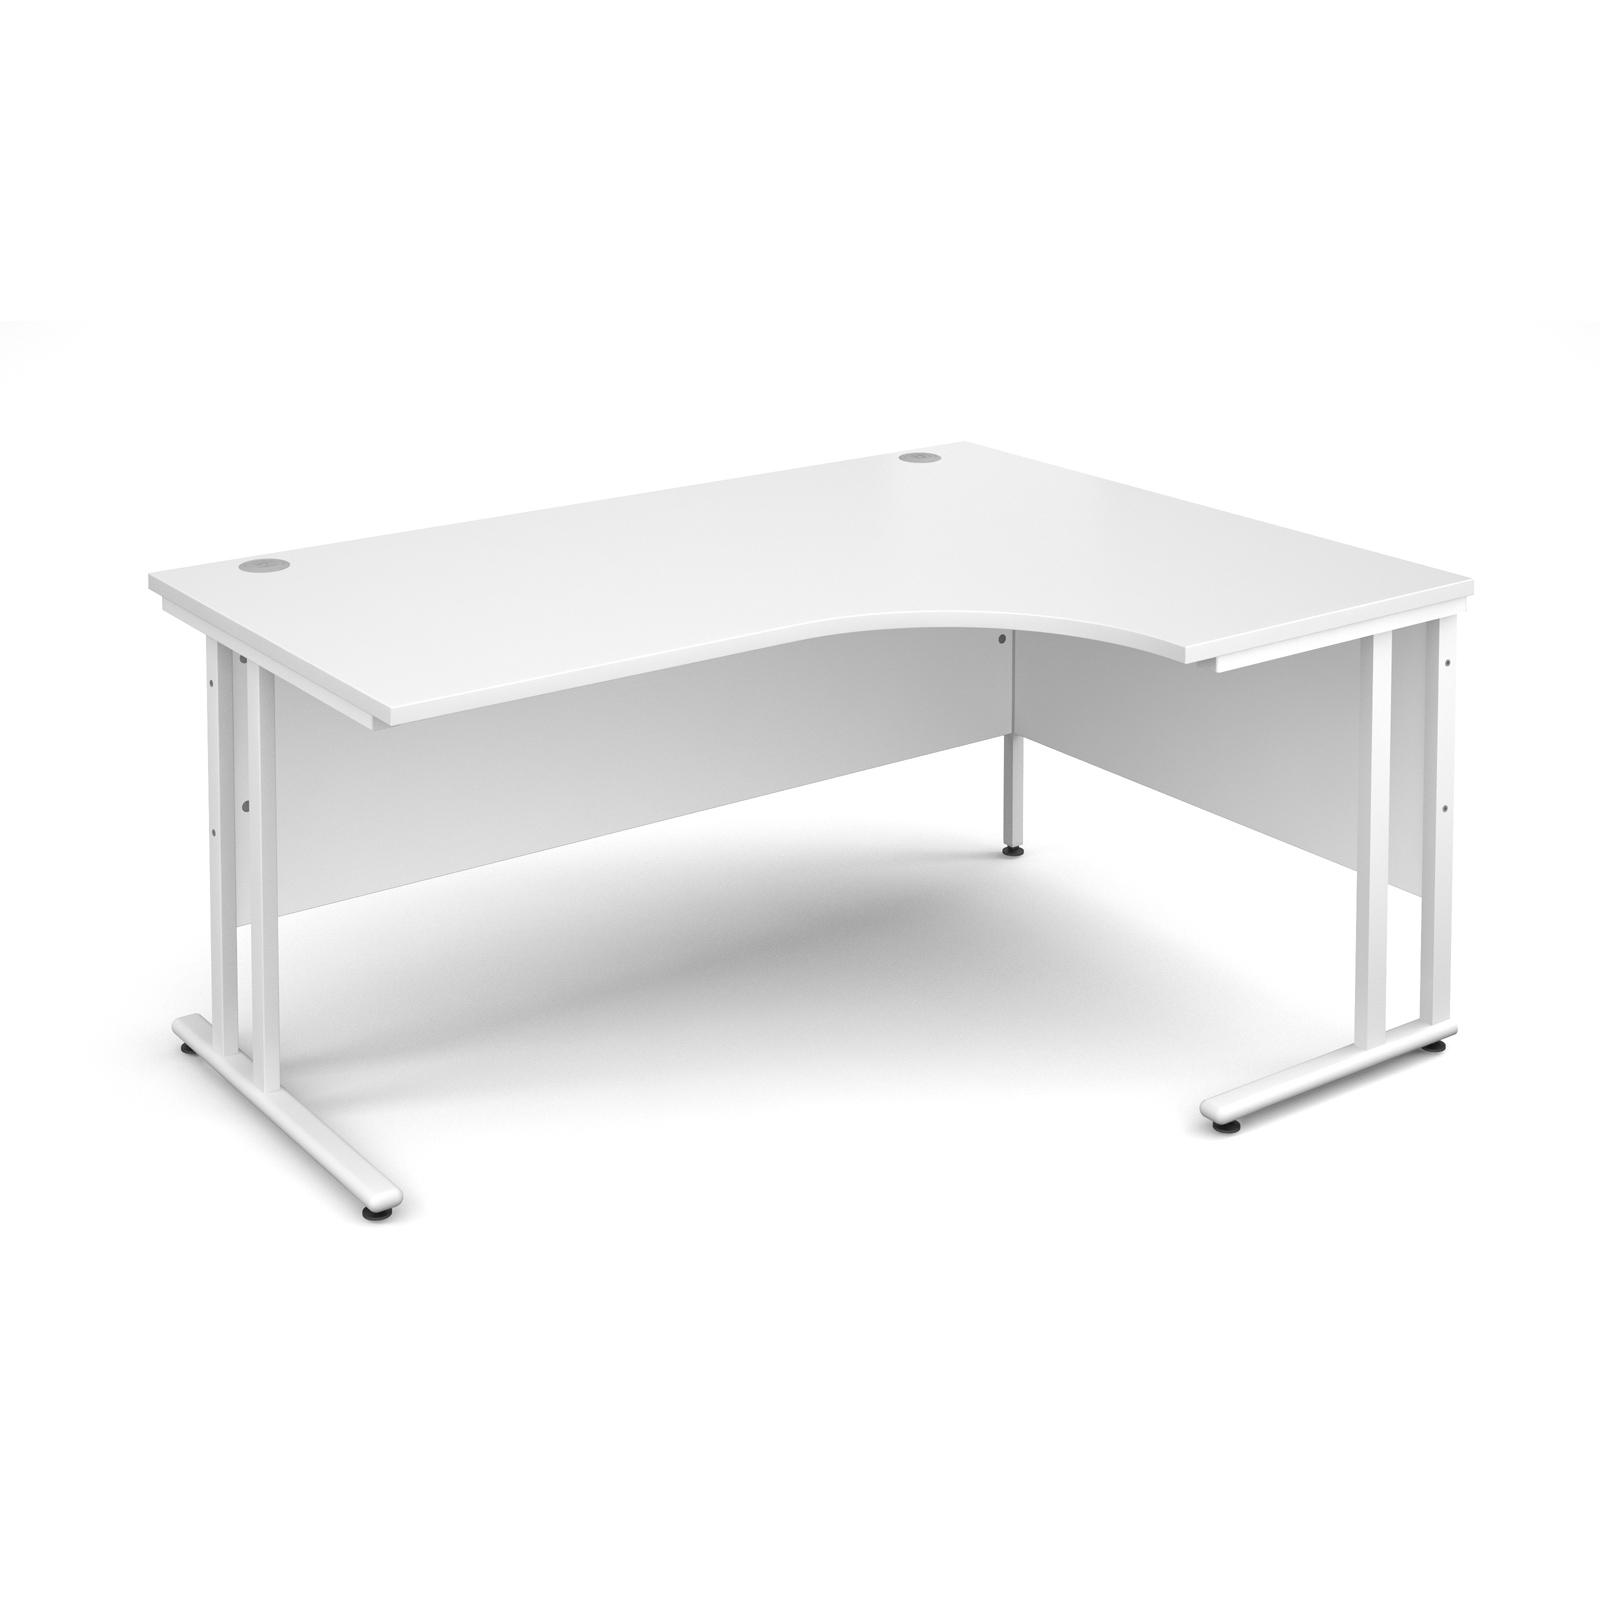 Maestro 25 WL right hand ergonomic desk 1600mm - white cantilever frame, white top